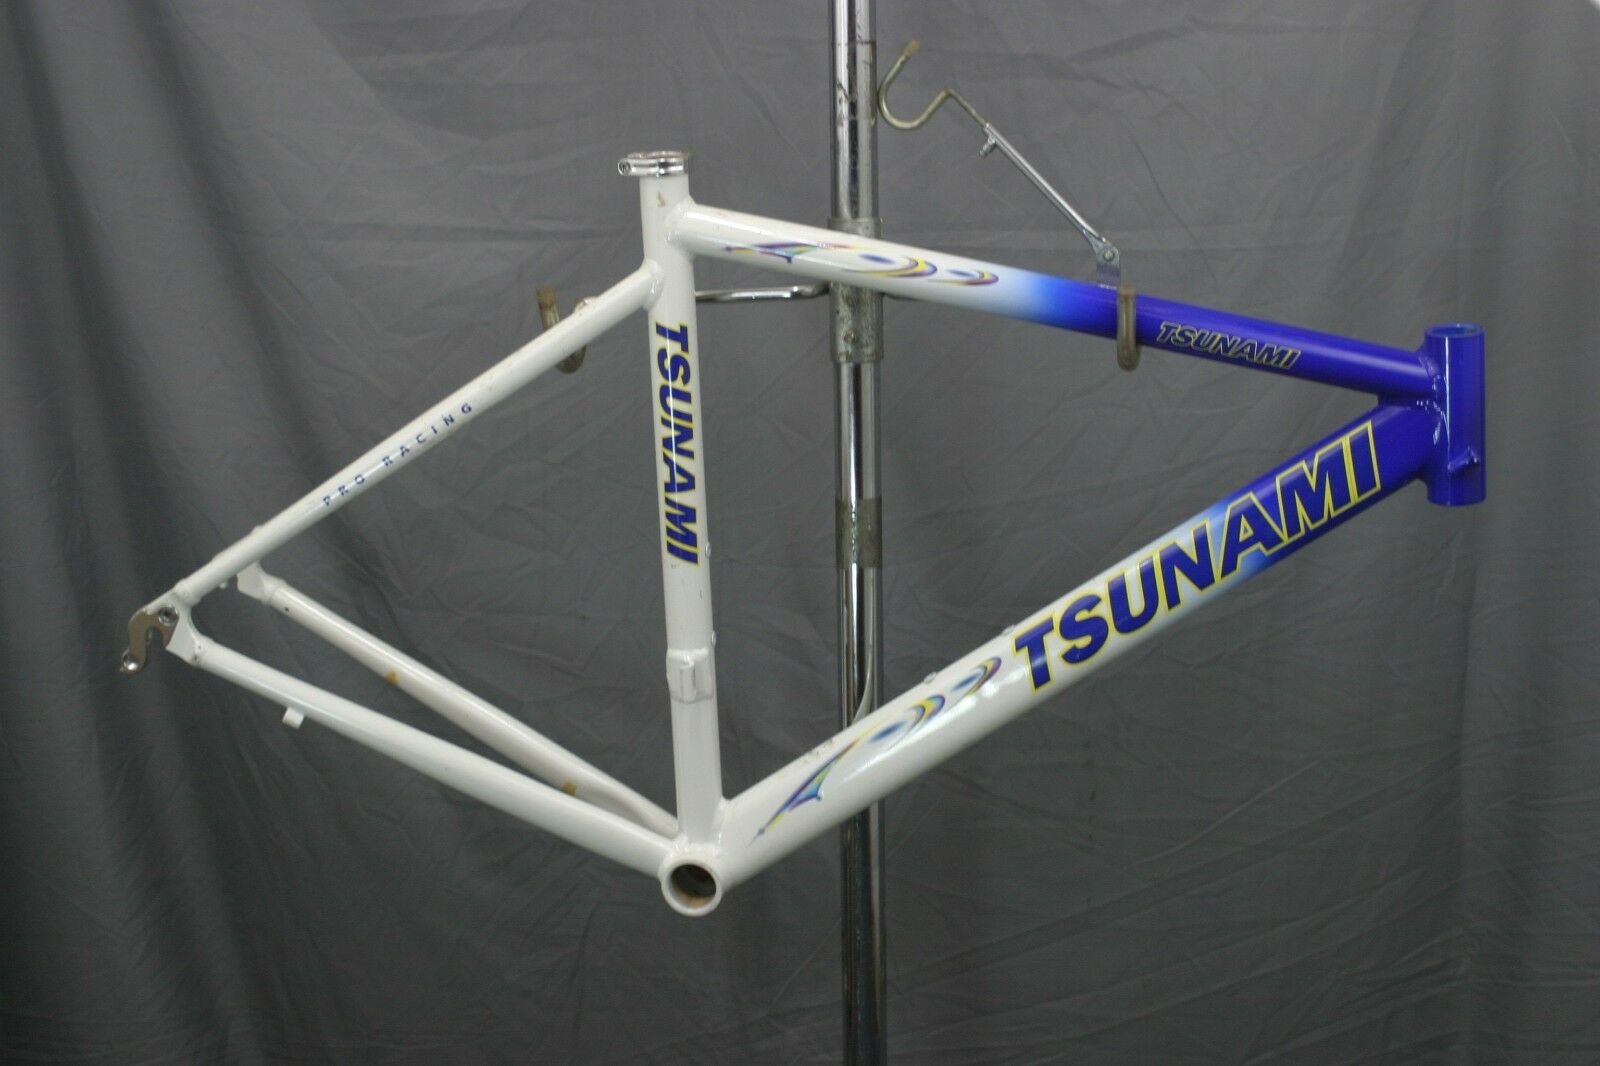 Tsunami Pro Road Bike Frame NEW Racing Triathalon Crit Small TX USA made Charity